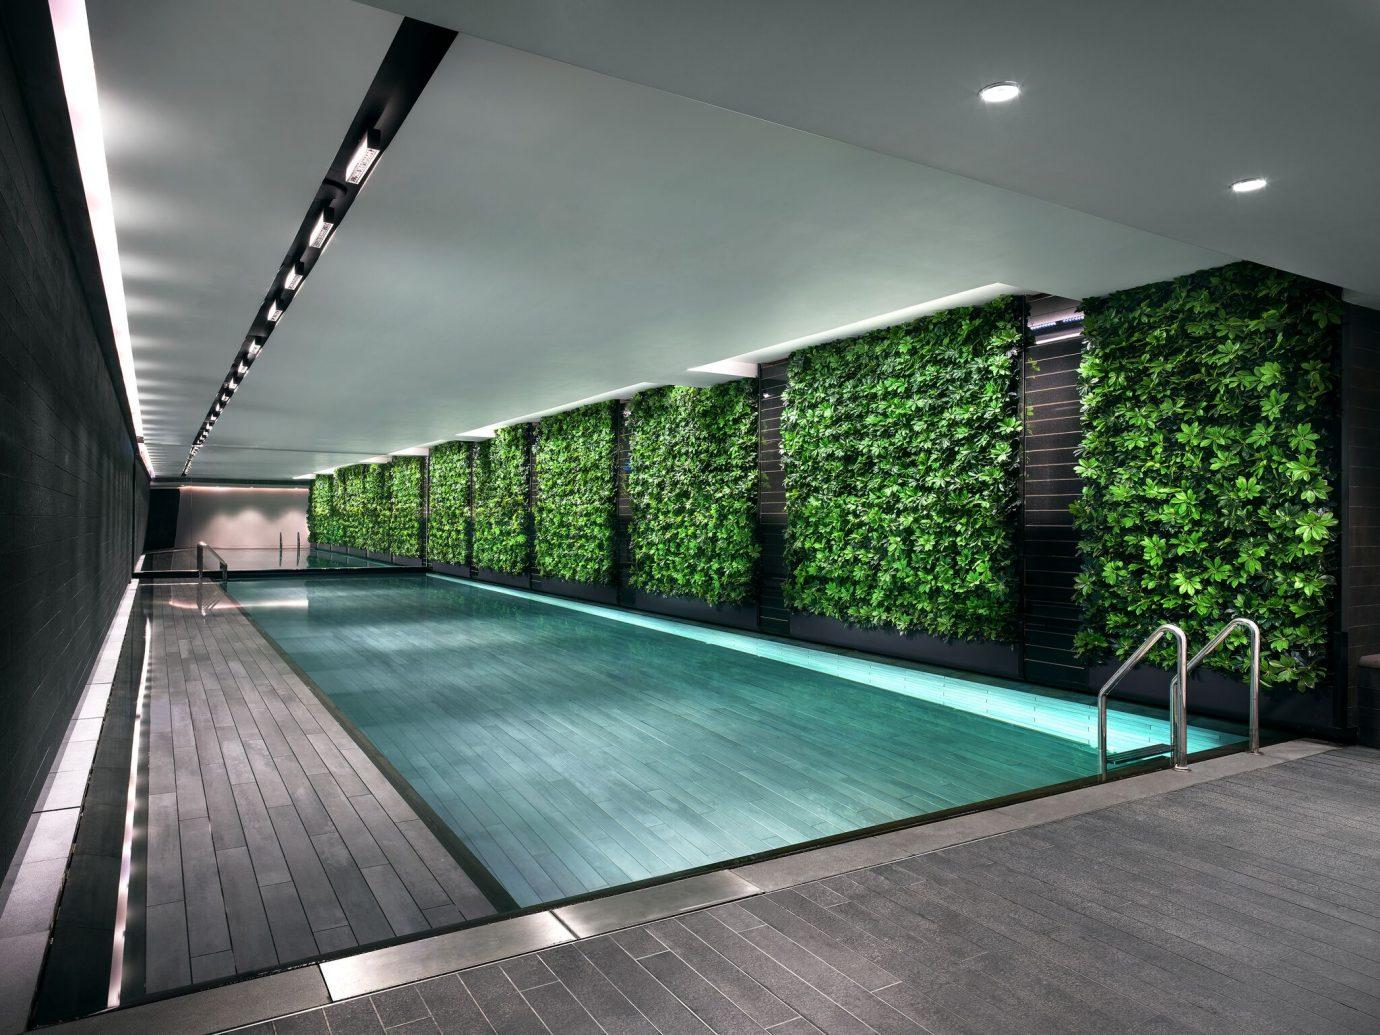 The Murray, Hong Kong pool